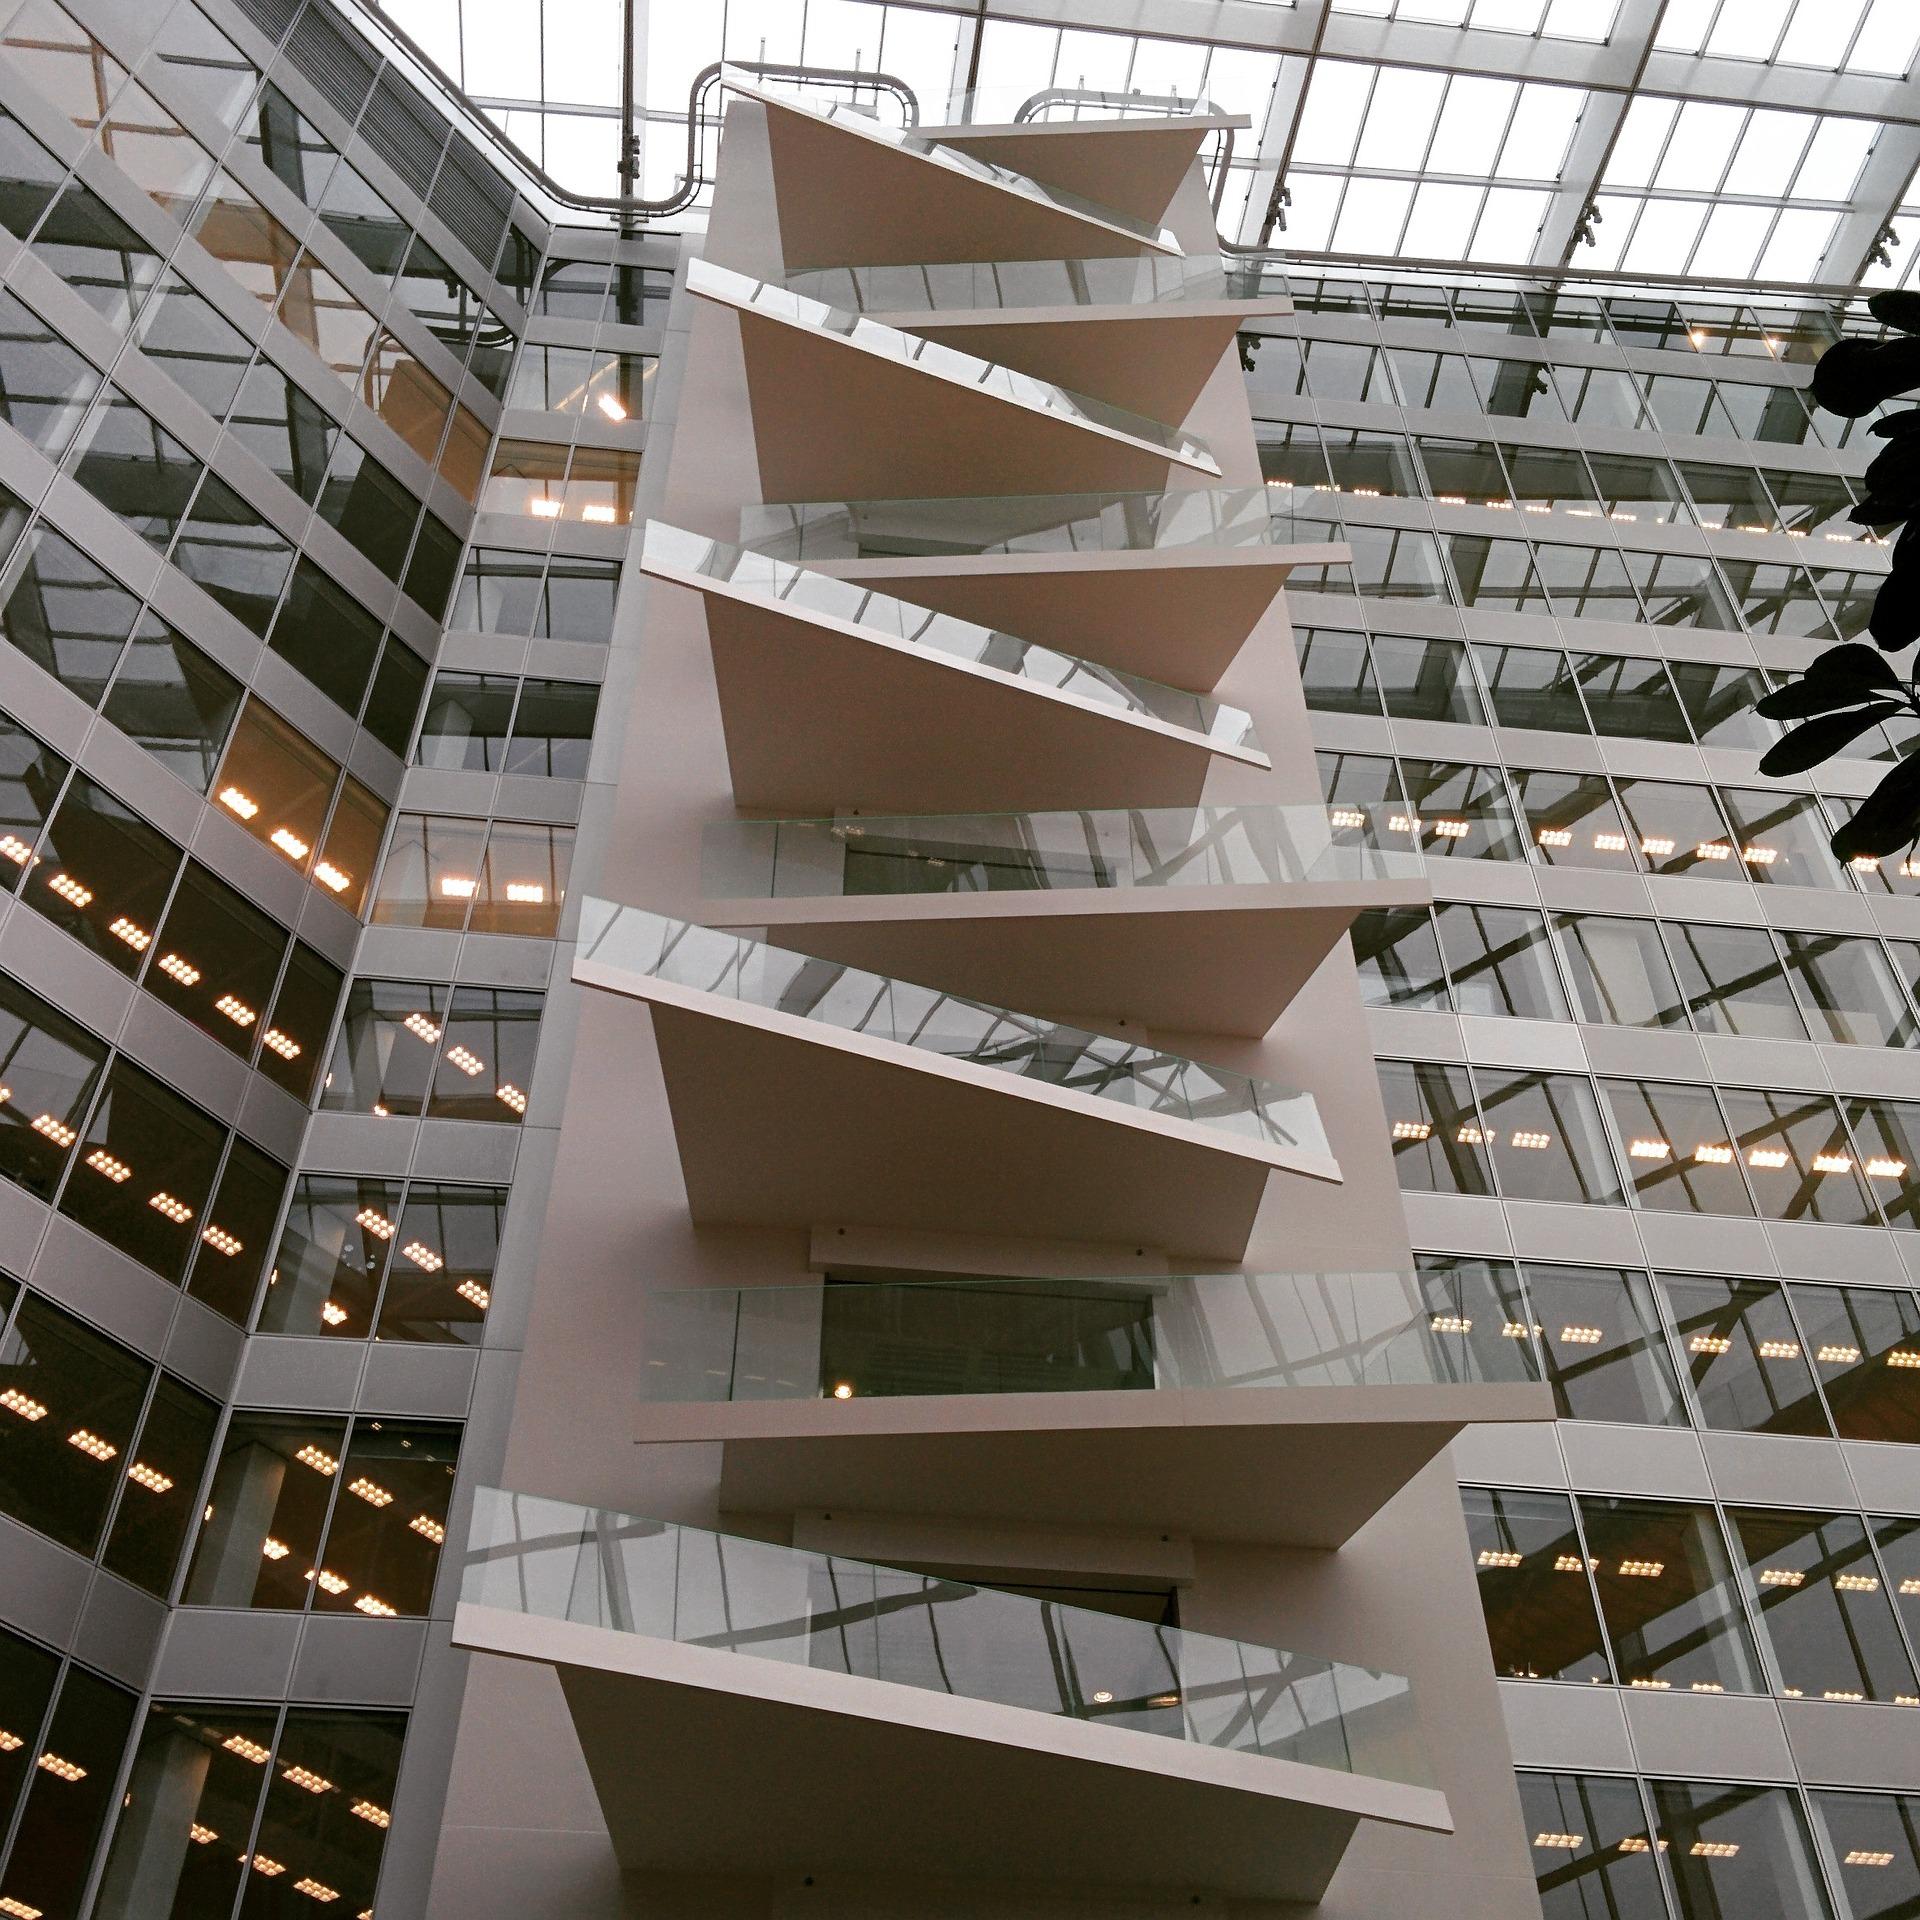 Commercial Architects Revit (1).jpg